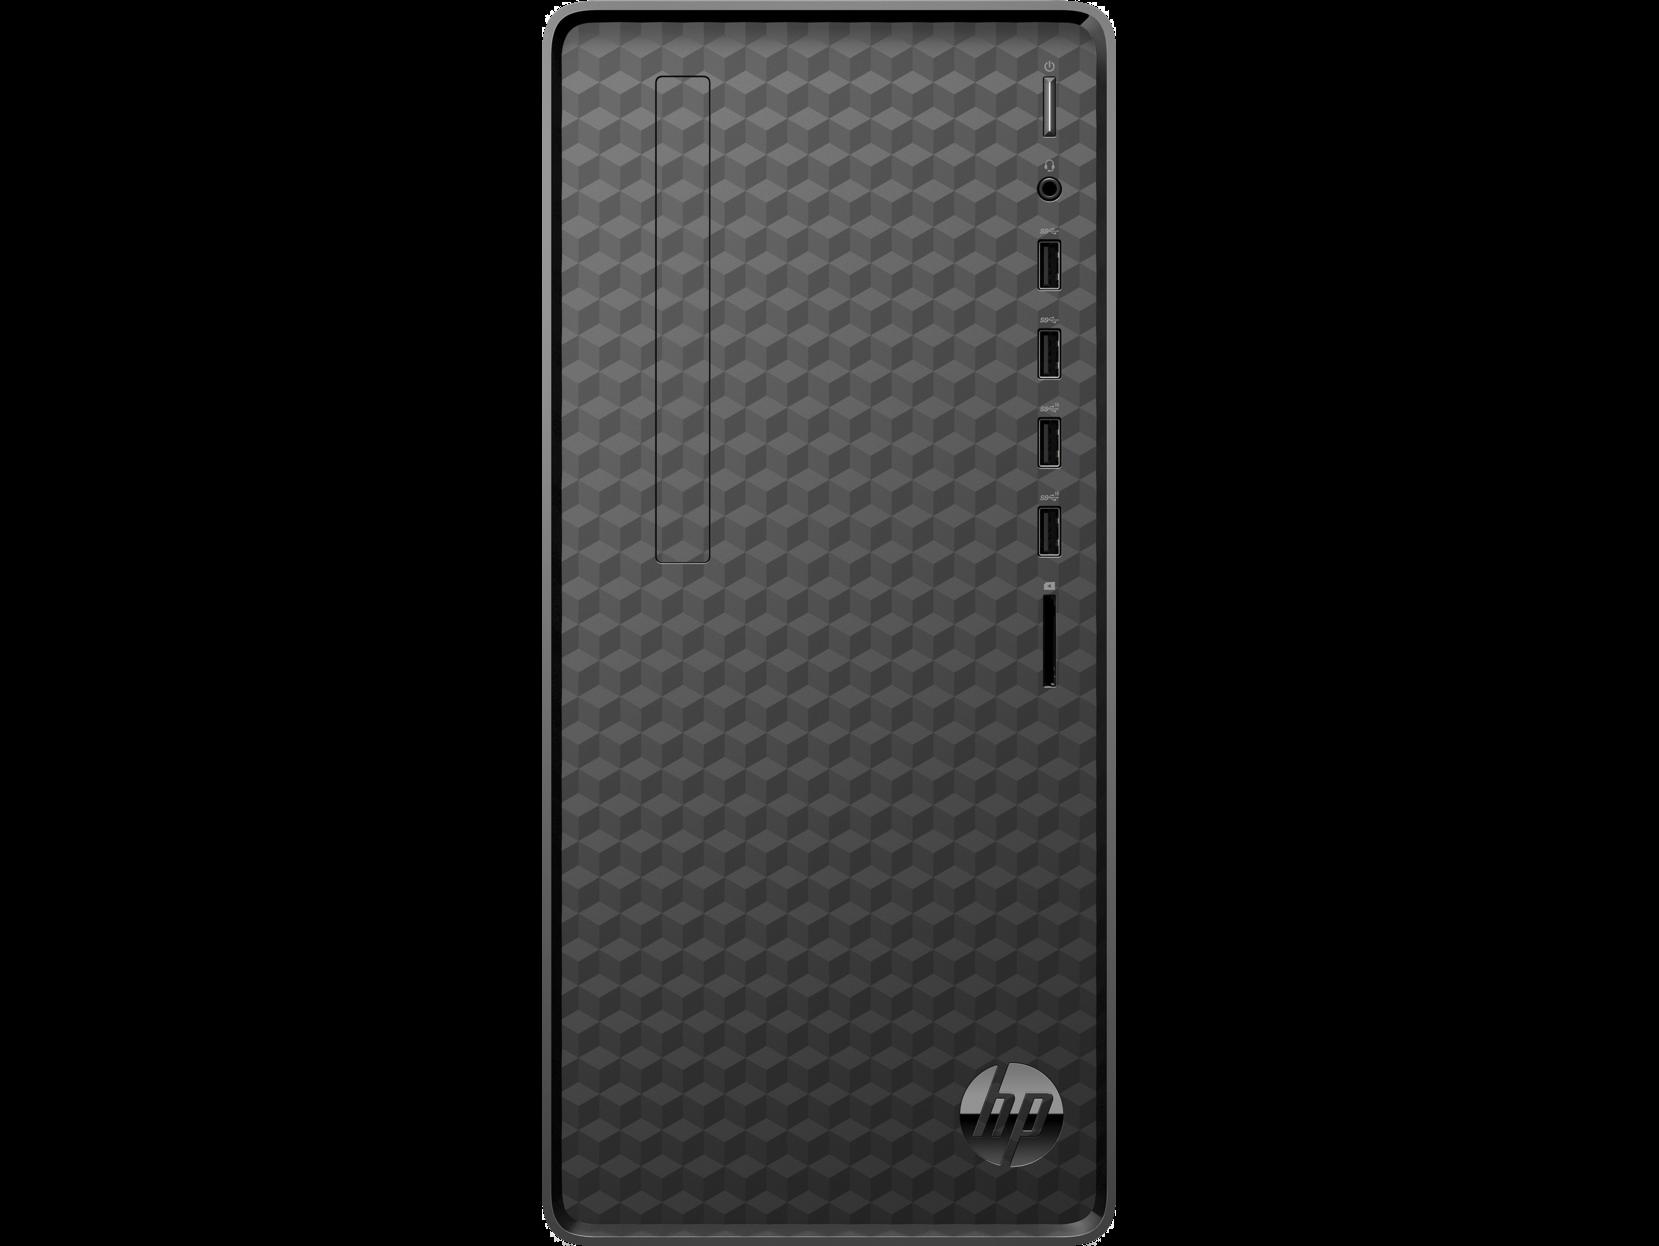 Системный блок HP M01-F1007ur, Intel Core i3 10100 3.6GHz, 8Gb RAM, 512Gb SSD, Nvidia GeForce GTX 1650 SUPER 4Gb, WiFi, BT, W10, черный (216C6EA)